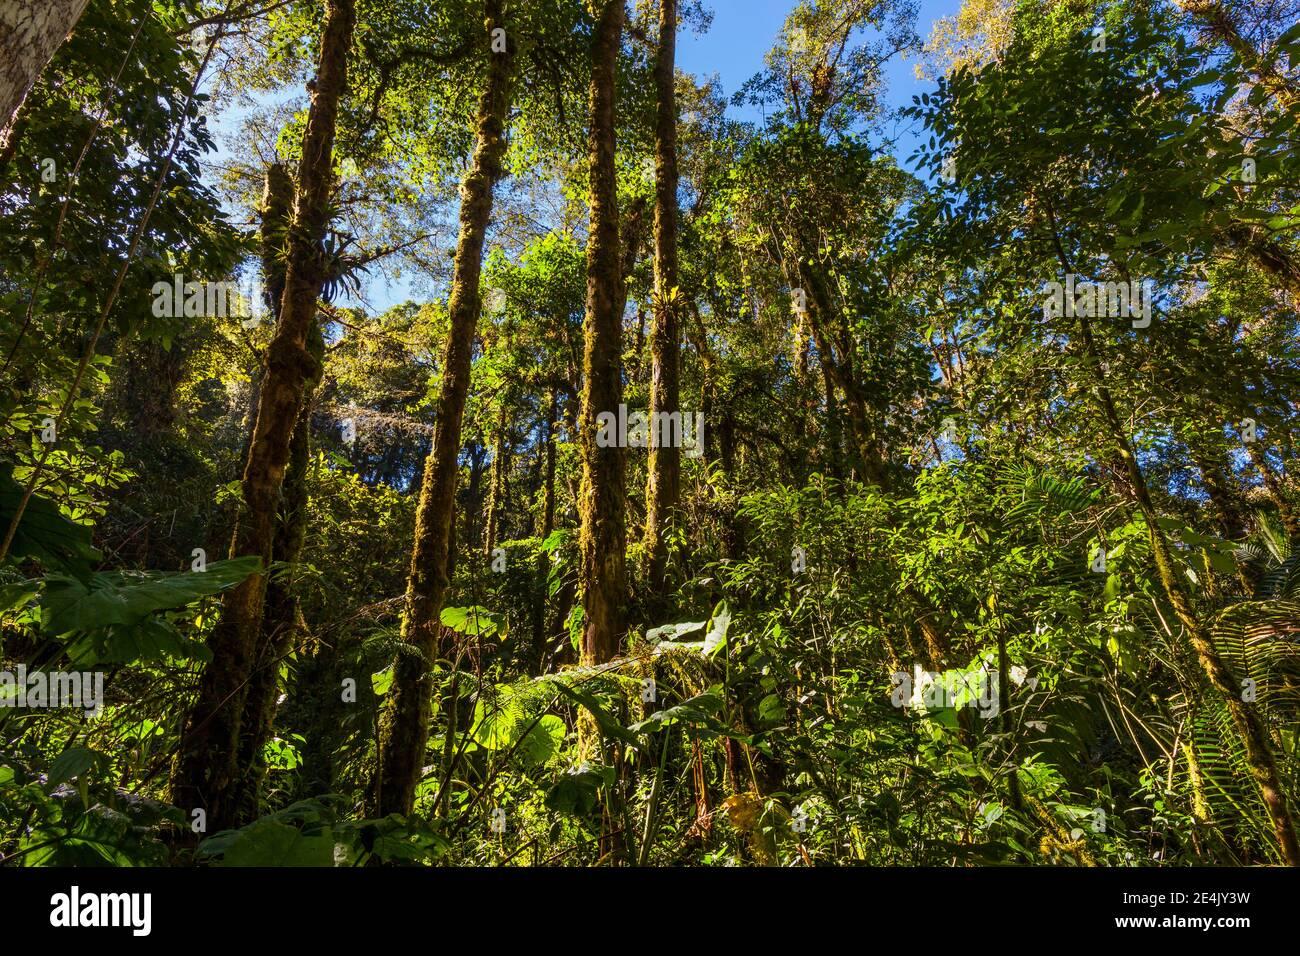 Lush cloudforest in La Amistad national park, Chiriqui province, Republic of Panama. Stock Photo